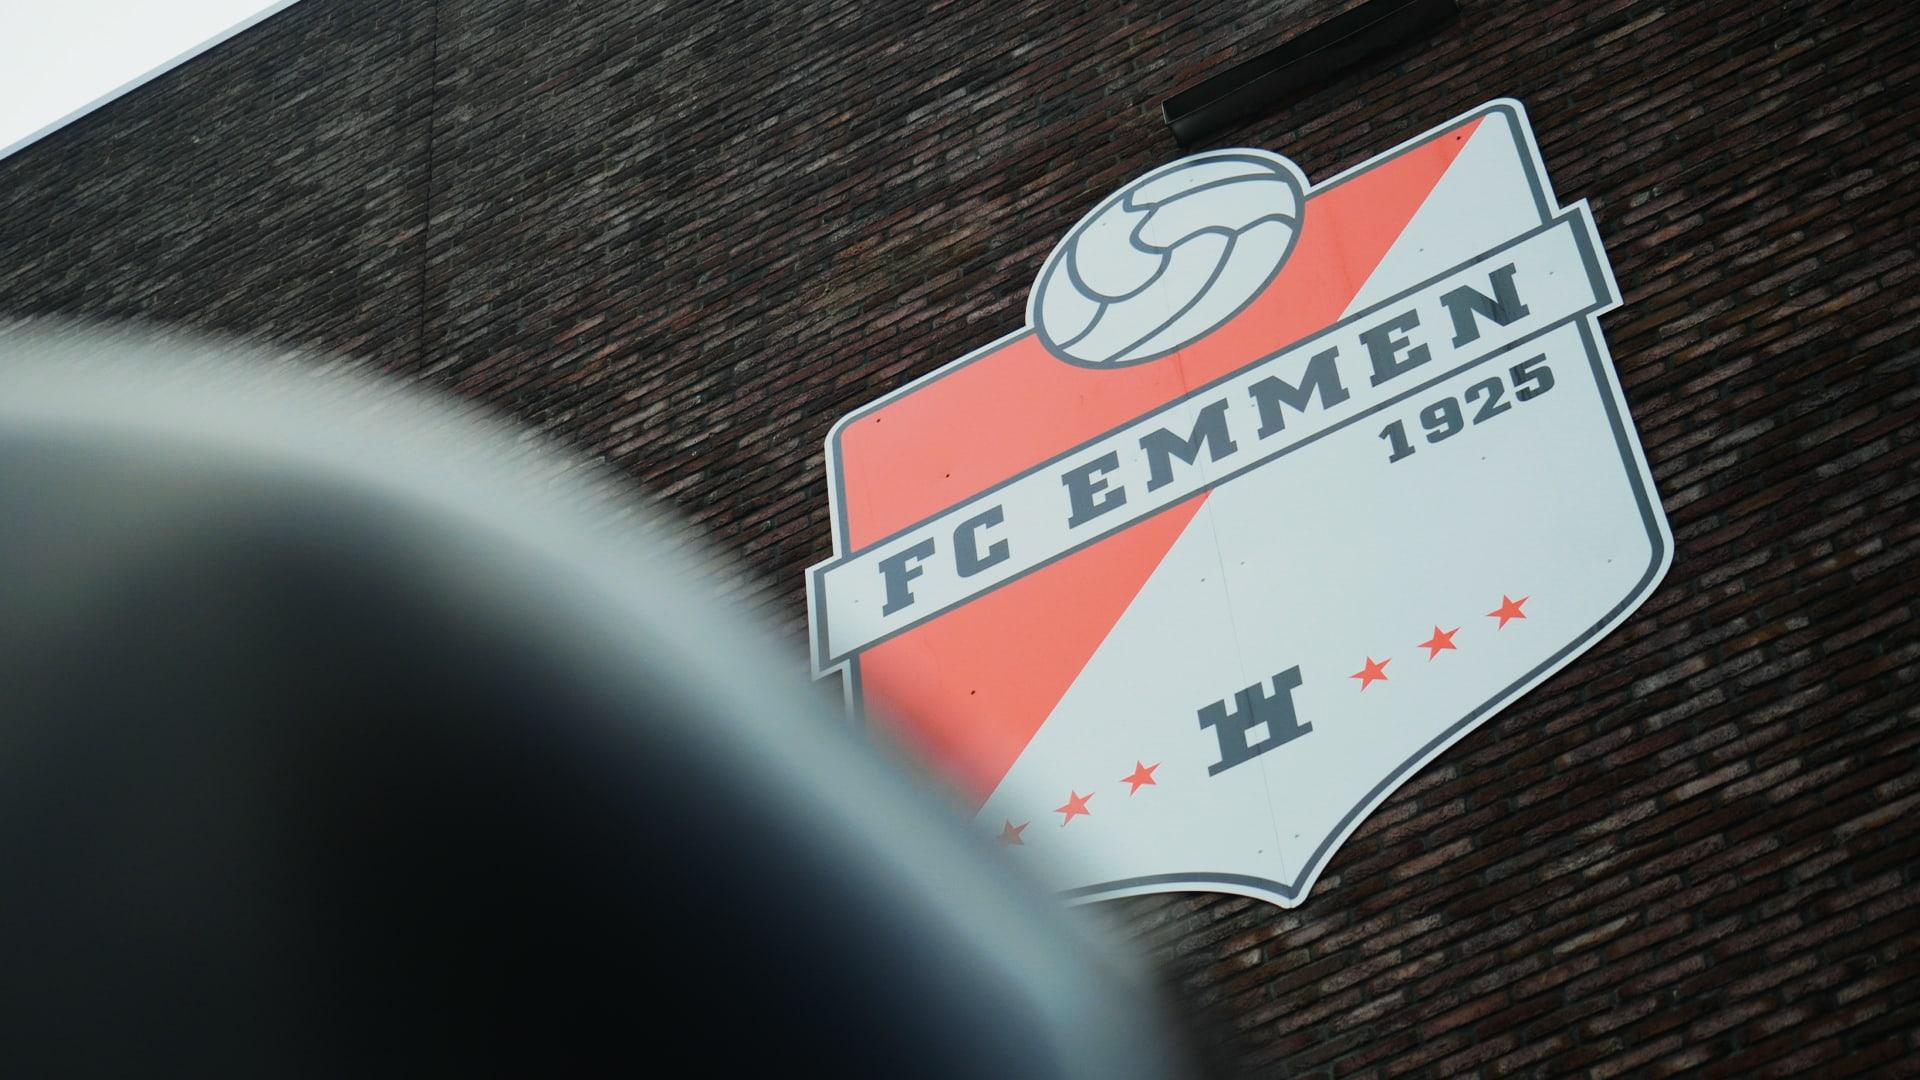 Promofilm Derksen & Derksen bij FC Emmen